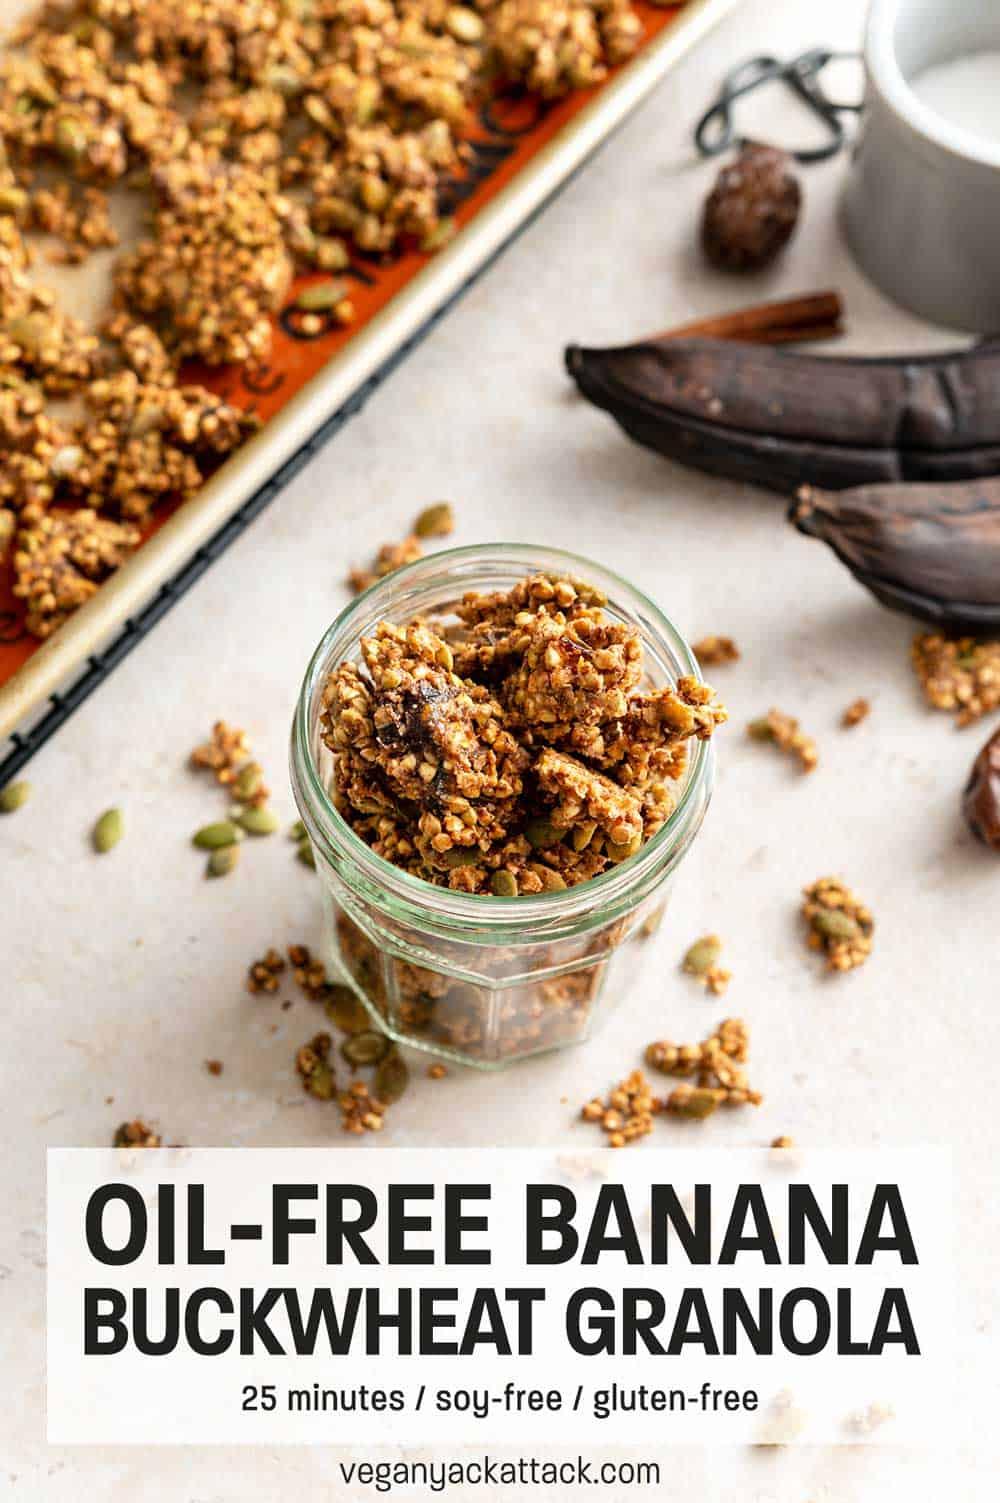 "Jar of granola next to ingredients and baking sheet with text ""Oil-free Banana Buckwheat Granola"""